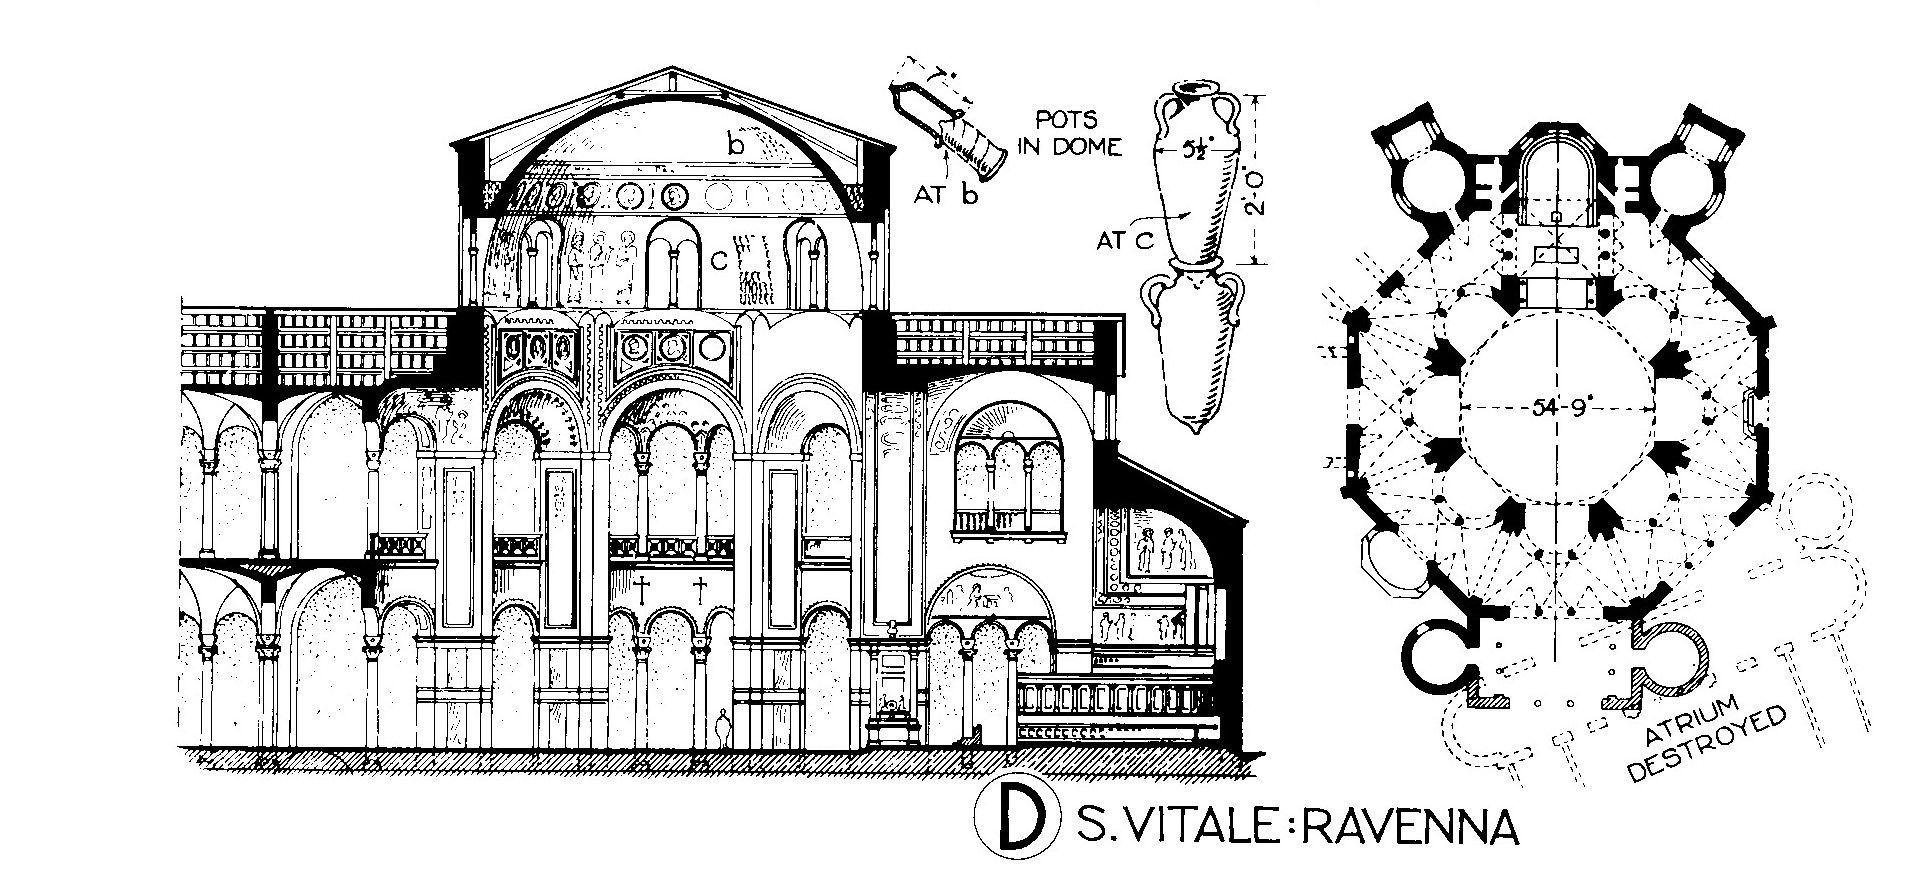 Ravenna San Vitale Pianta E Prospetto Ravenna Ravenna Italy Byzantine Architecture